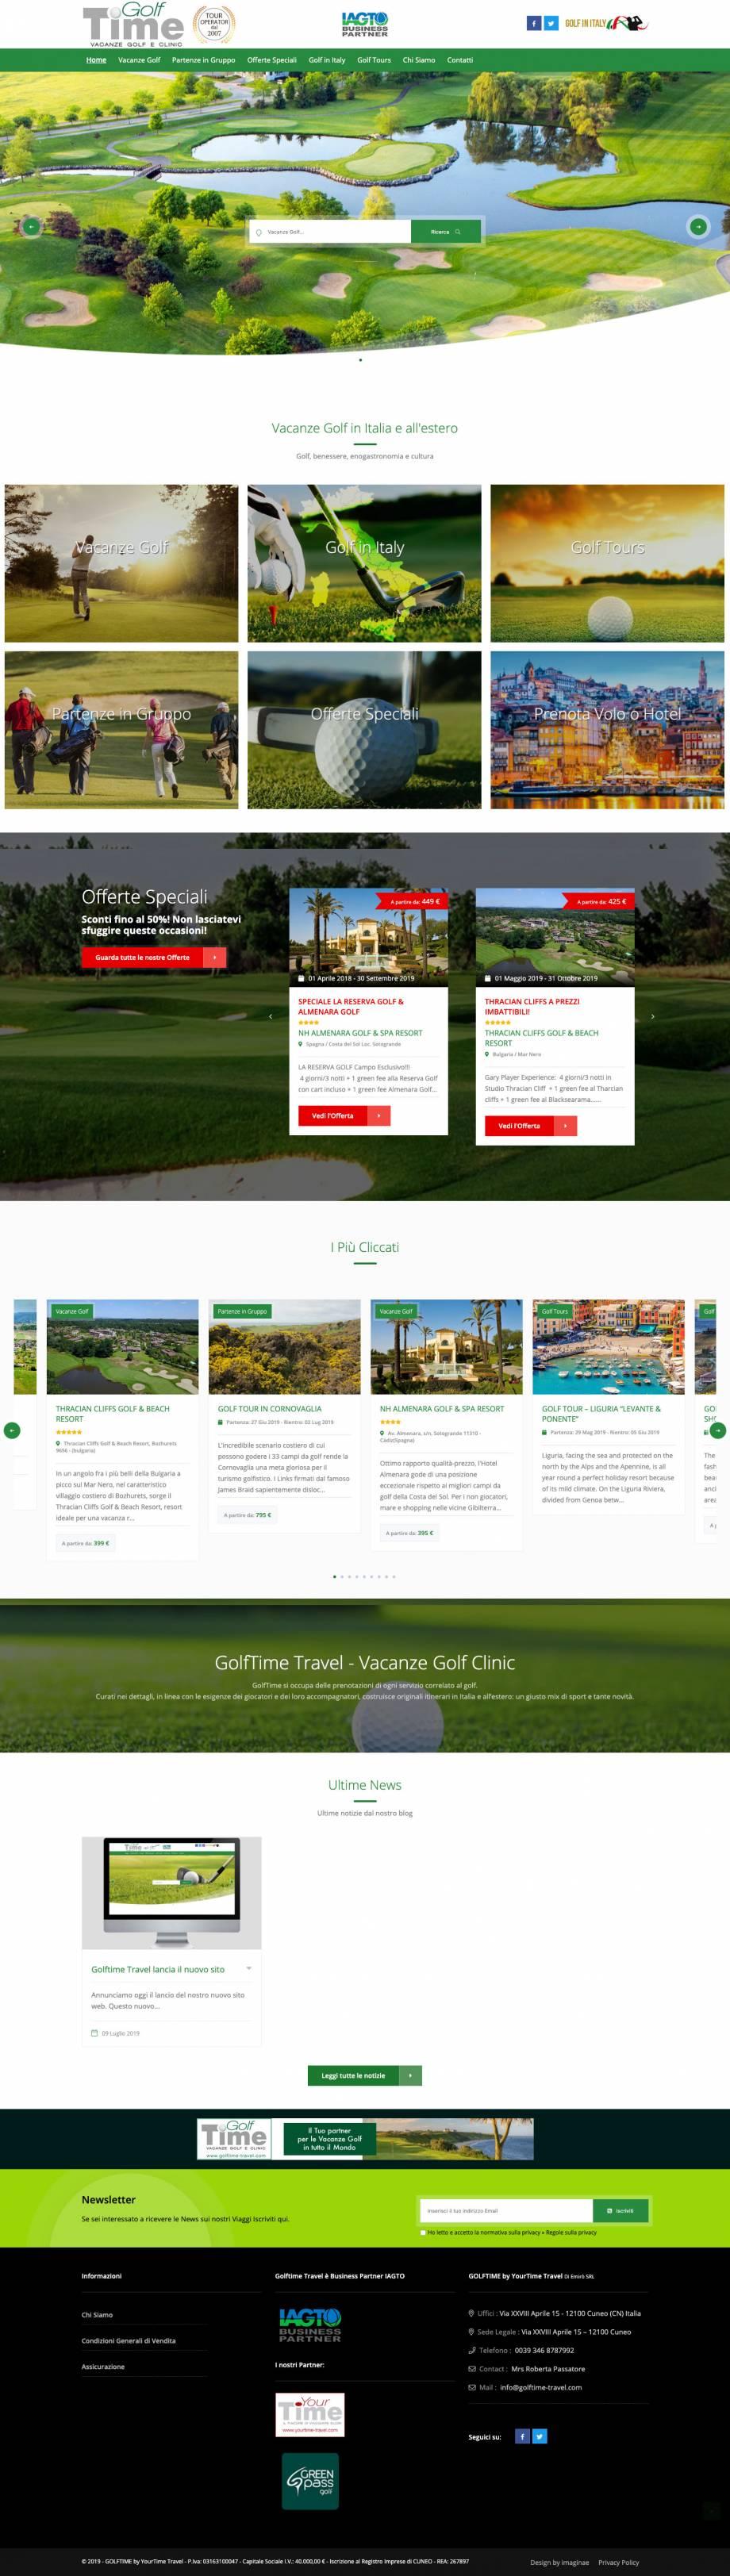 Web Design, Web Site, Responsive Smartphone & Tablet, Content Management Systems (CMS), Applicazioni Web Personalizzate,